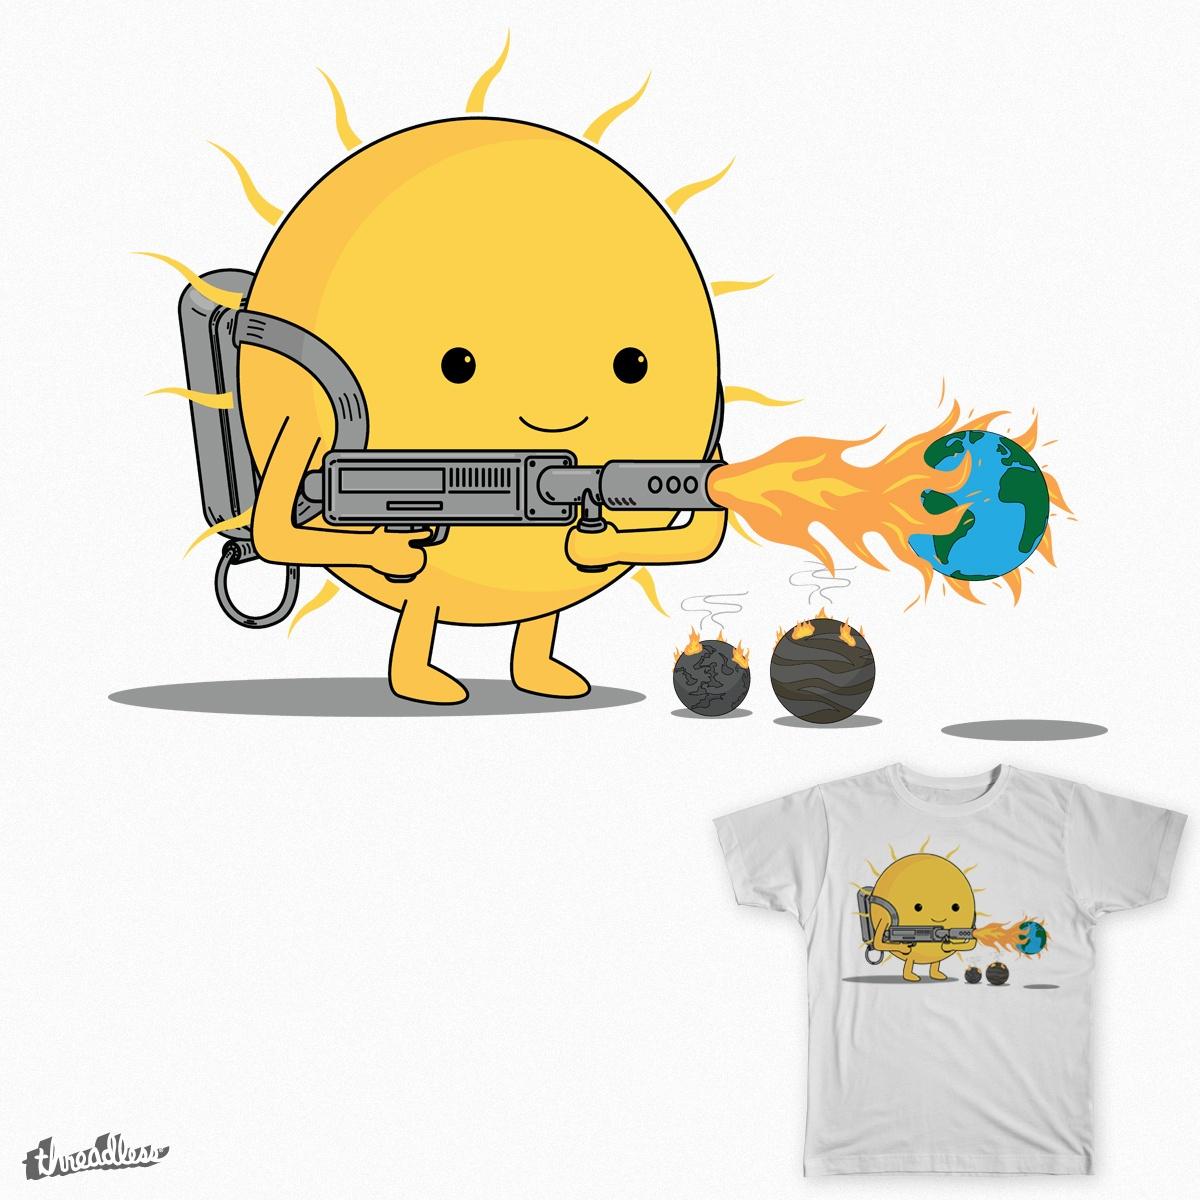 Sunblock This! by lazysundave on Threadless